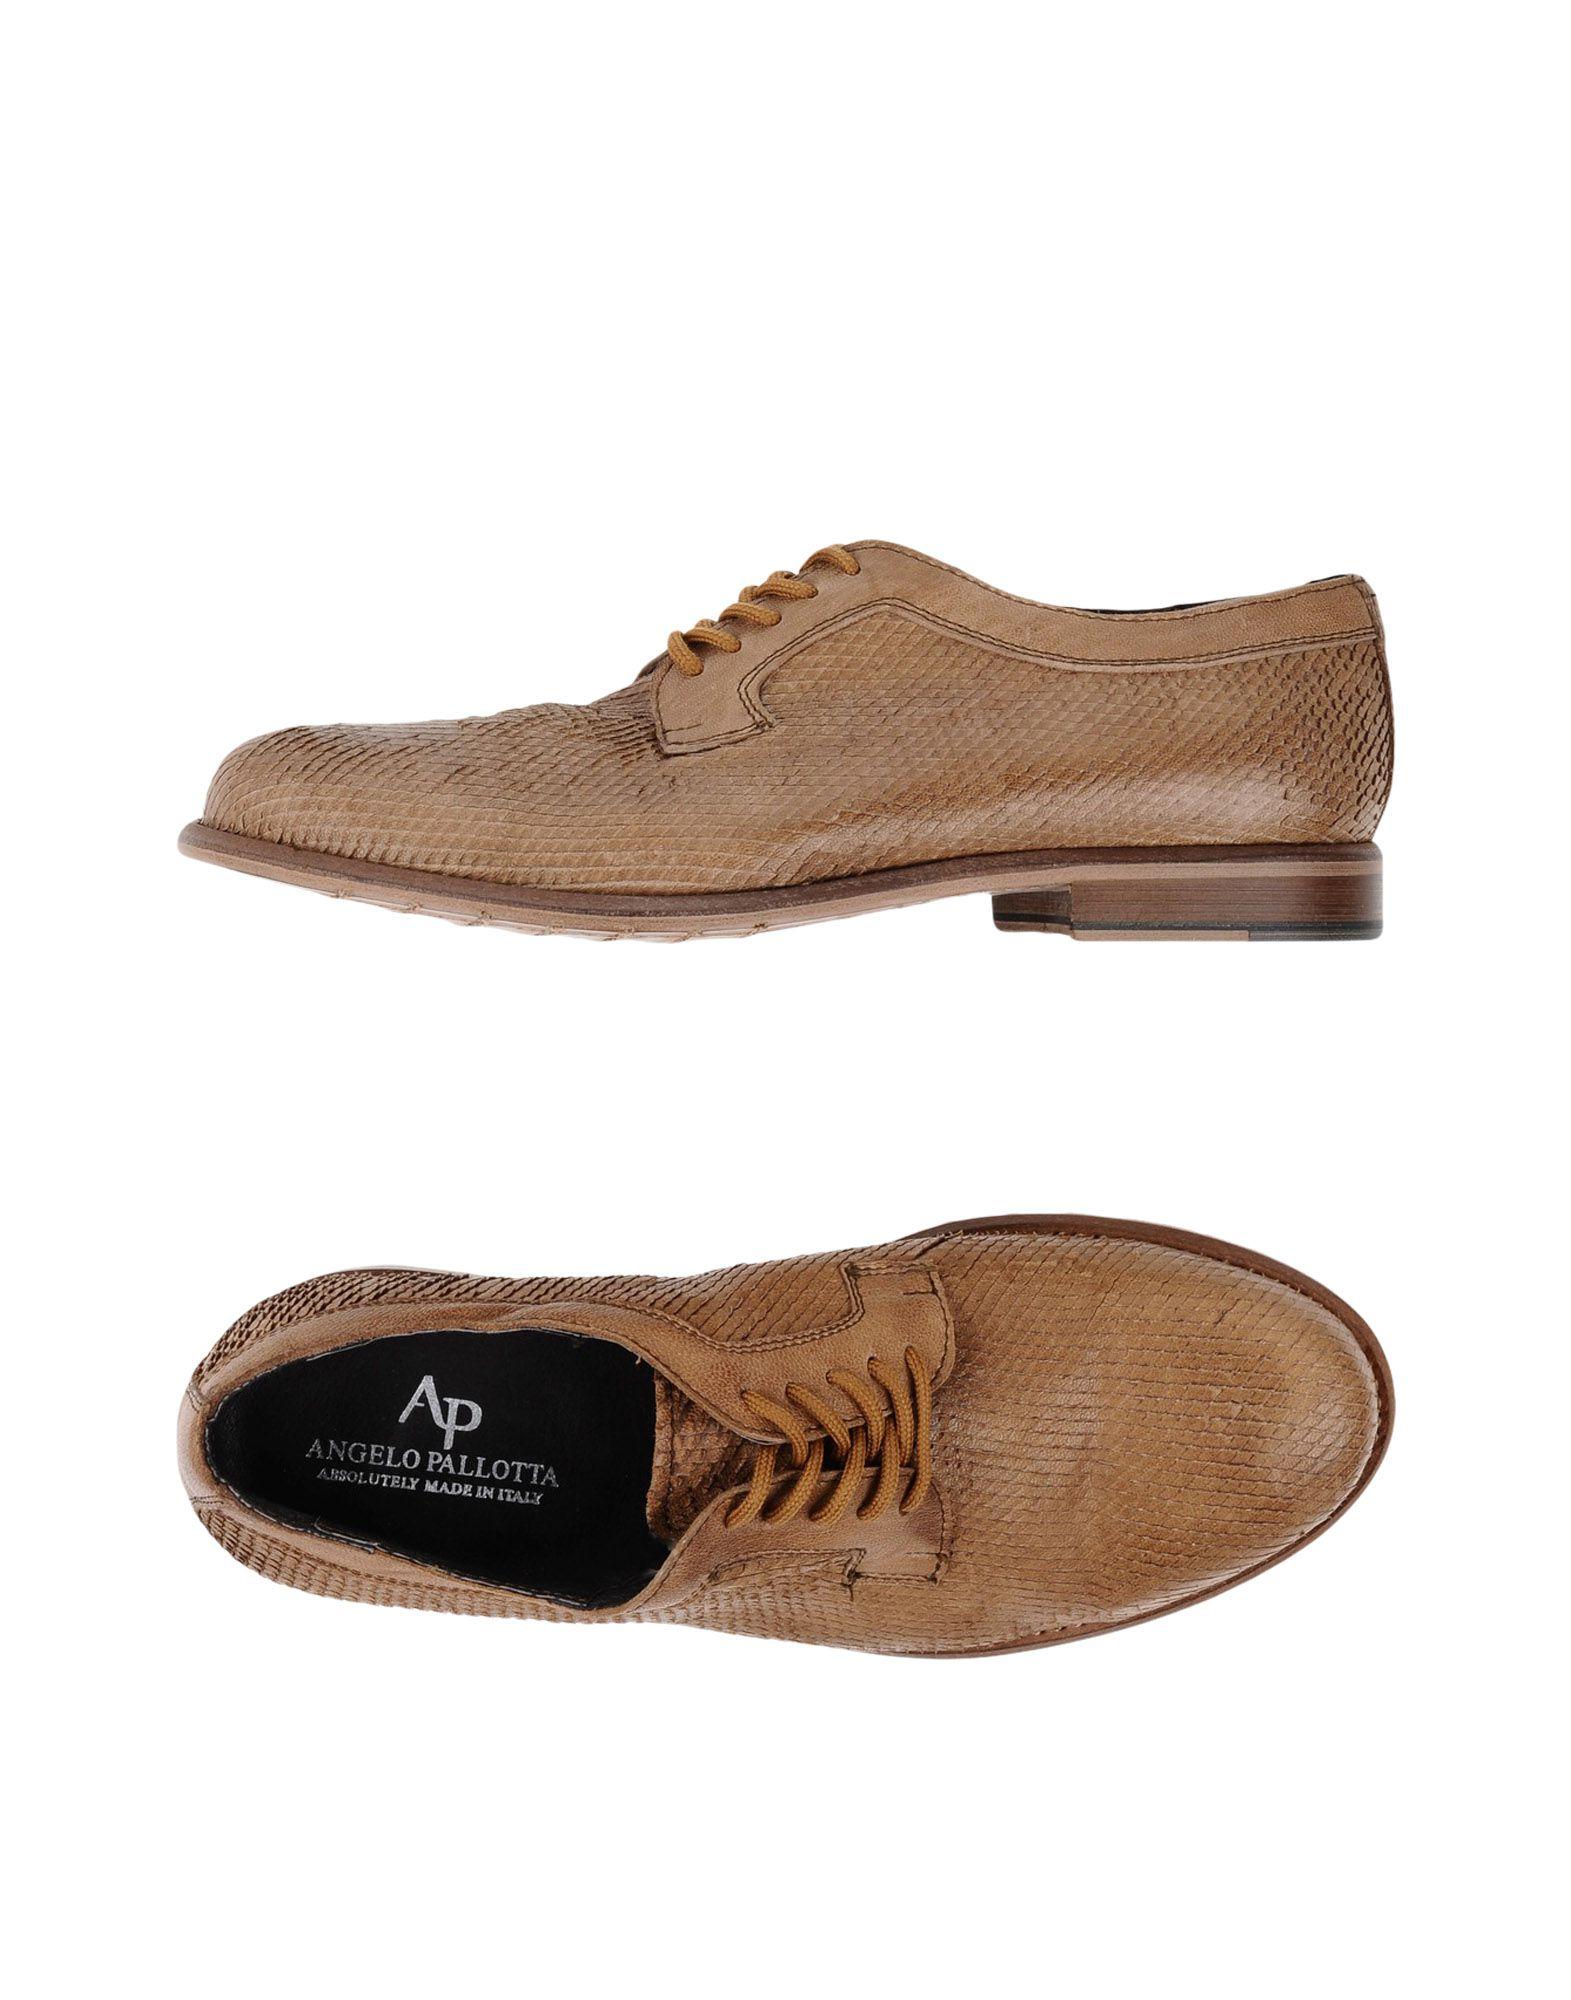 ФОТО angelo pallotta Обувь на шнурках